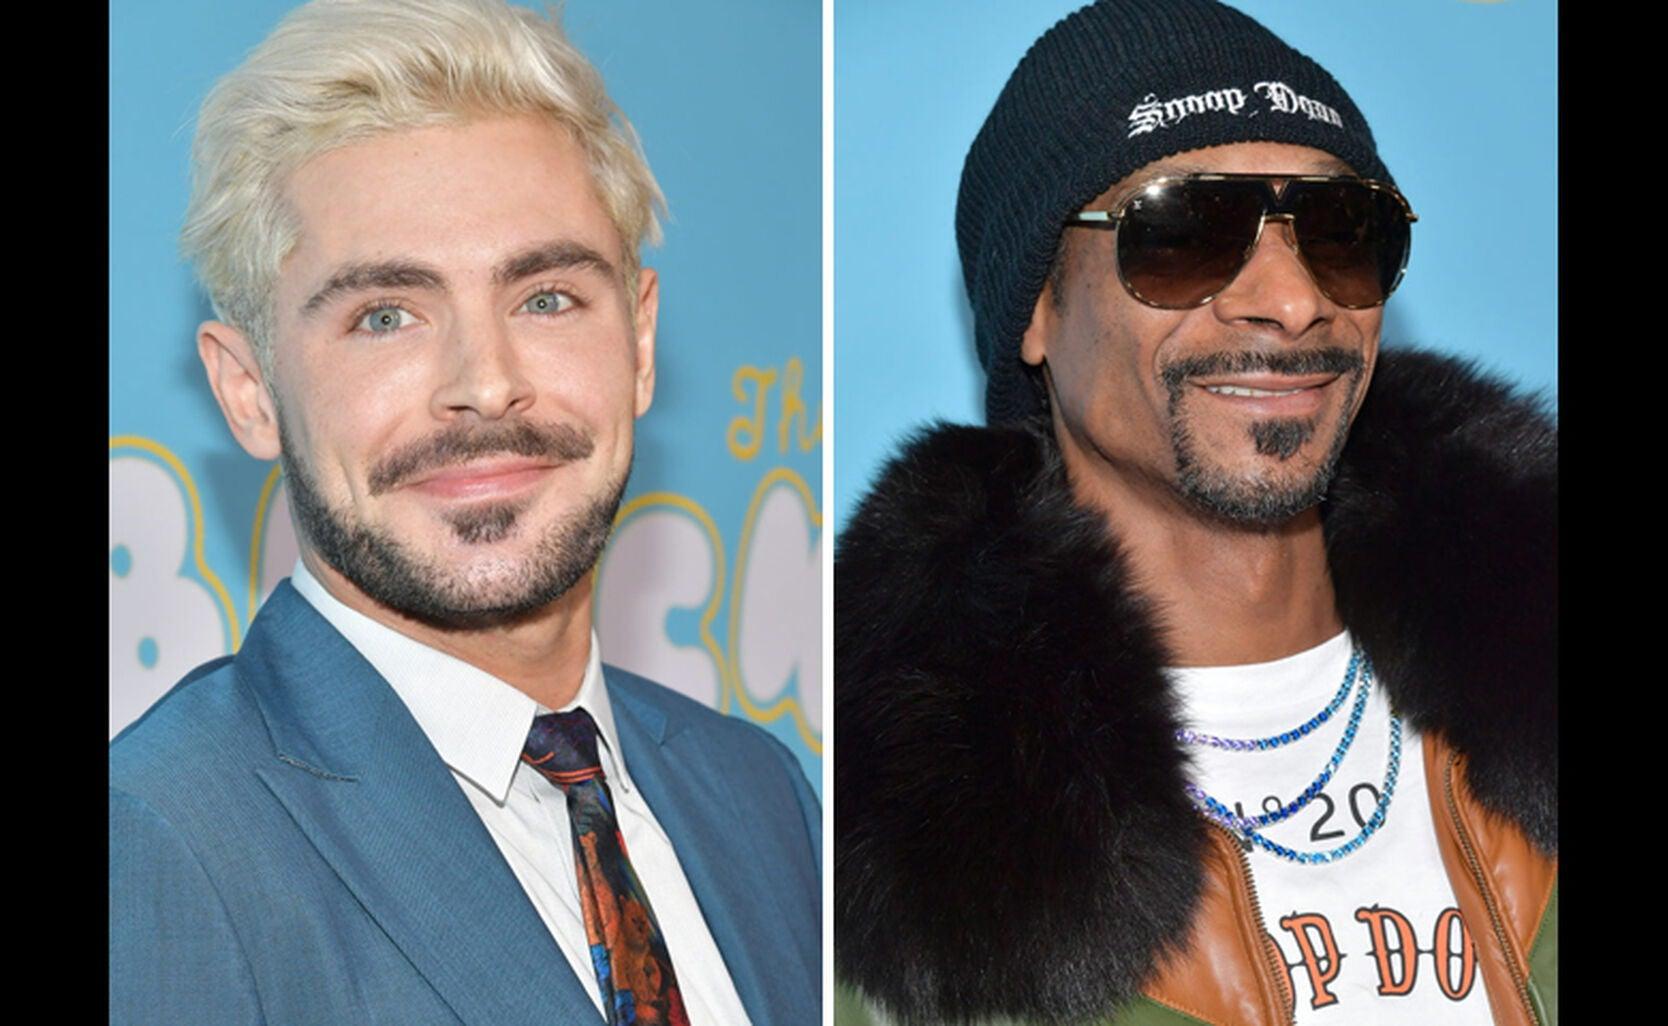 Zac Efron, Snoop Dogg